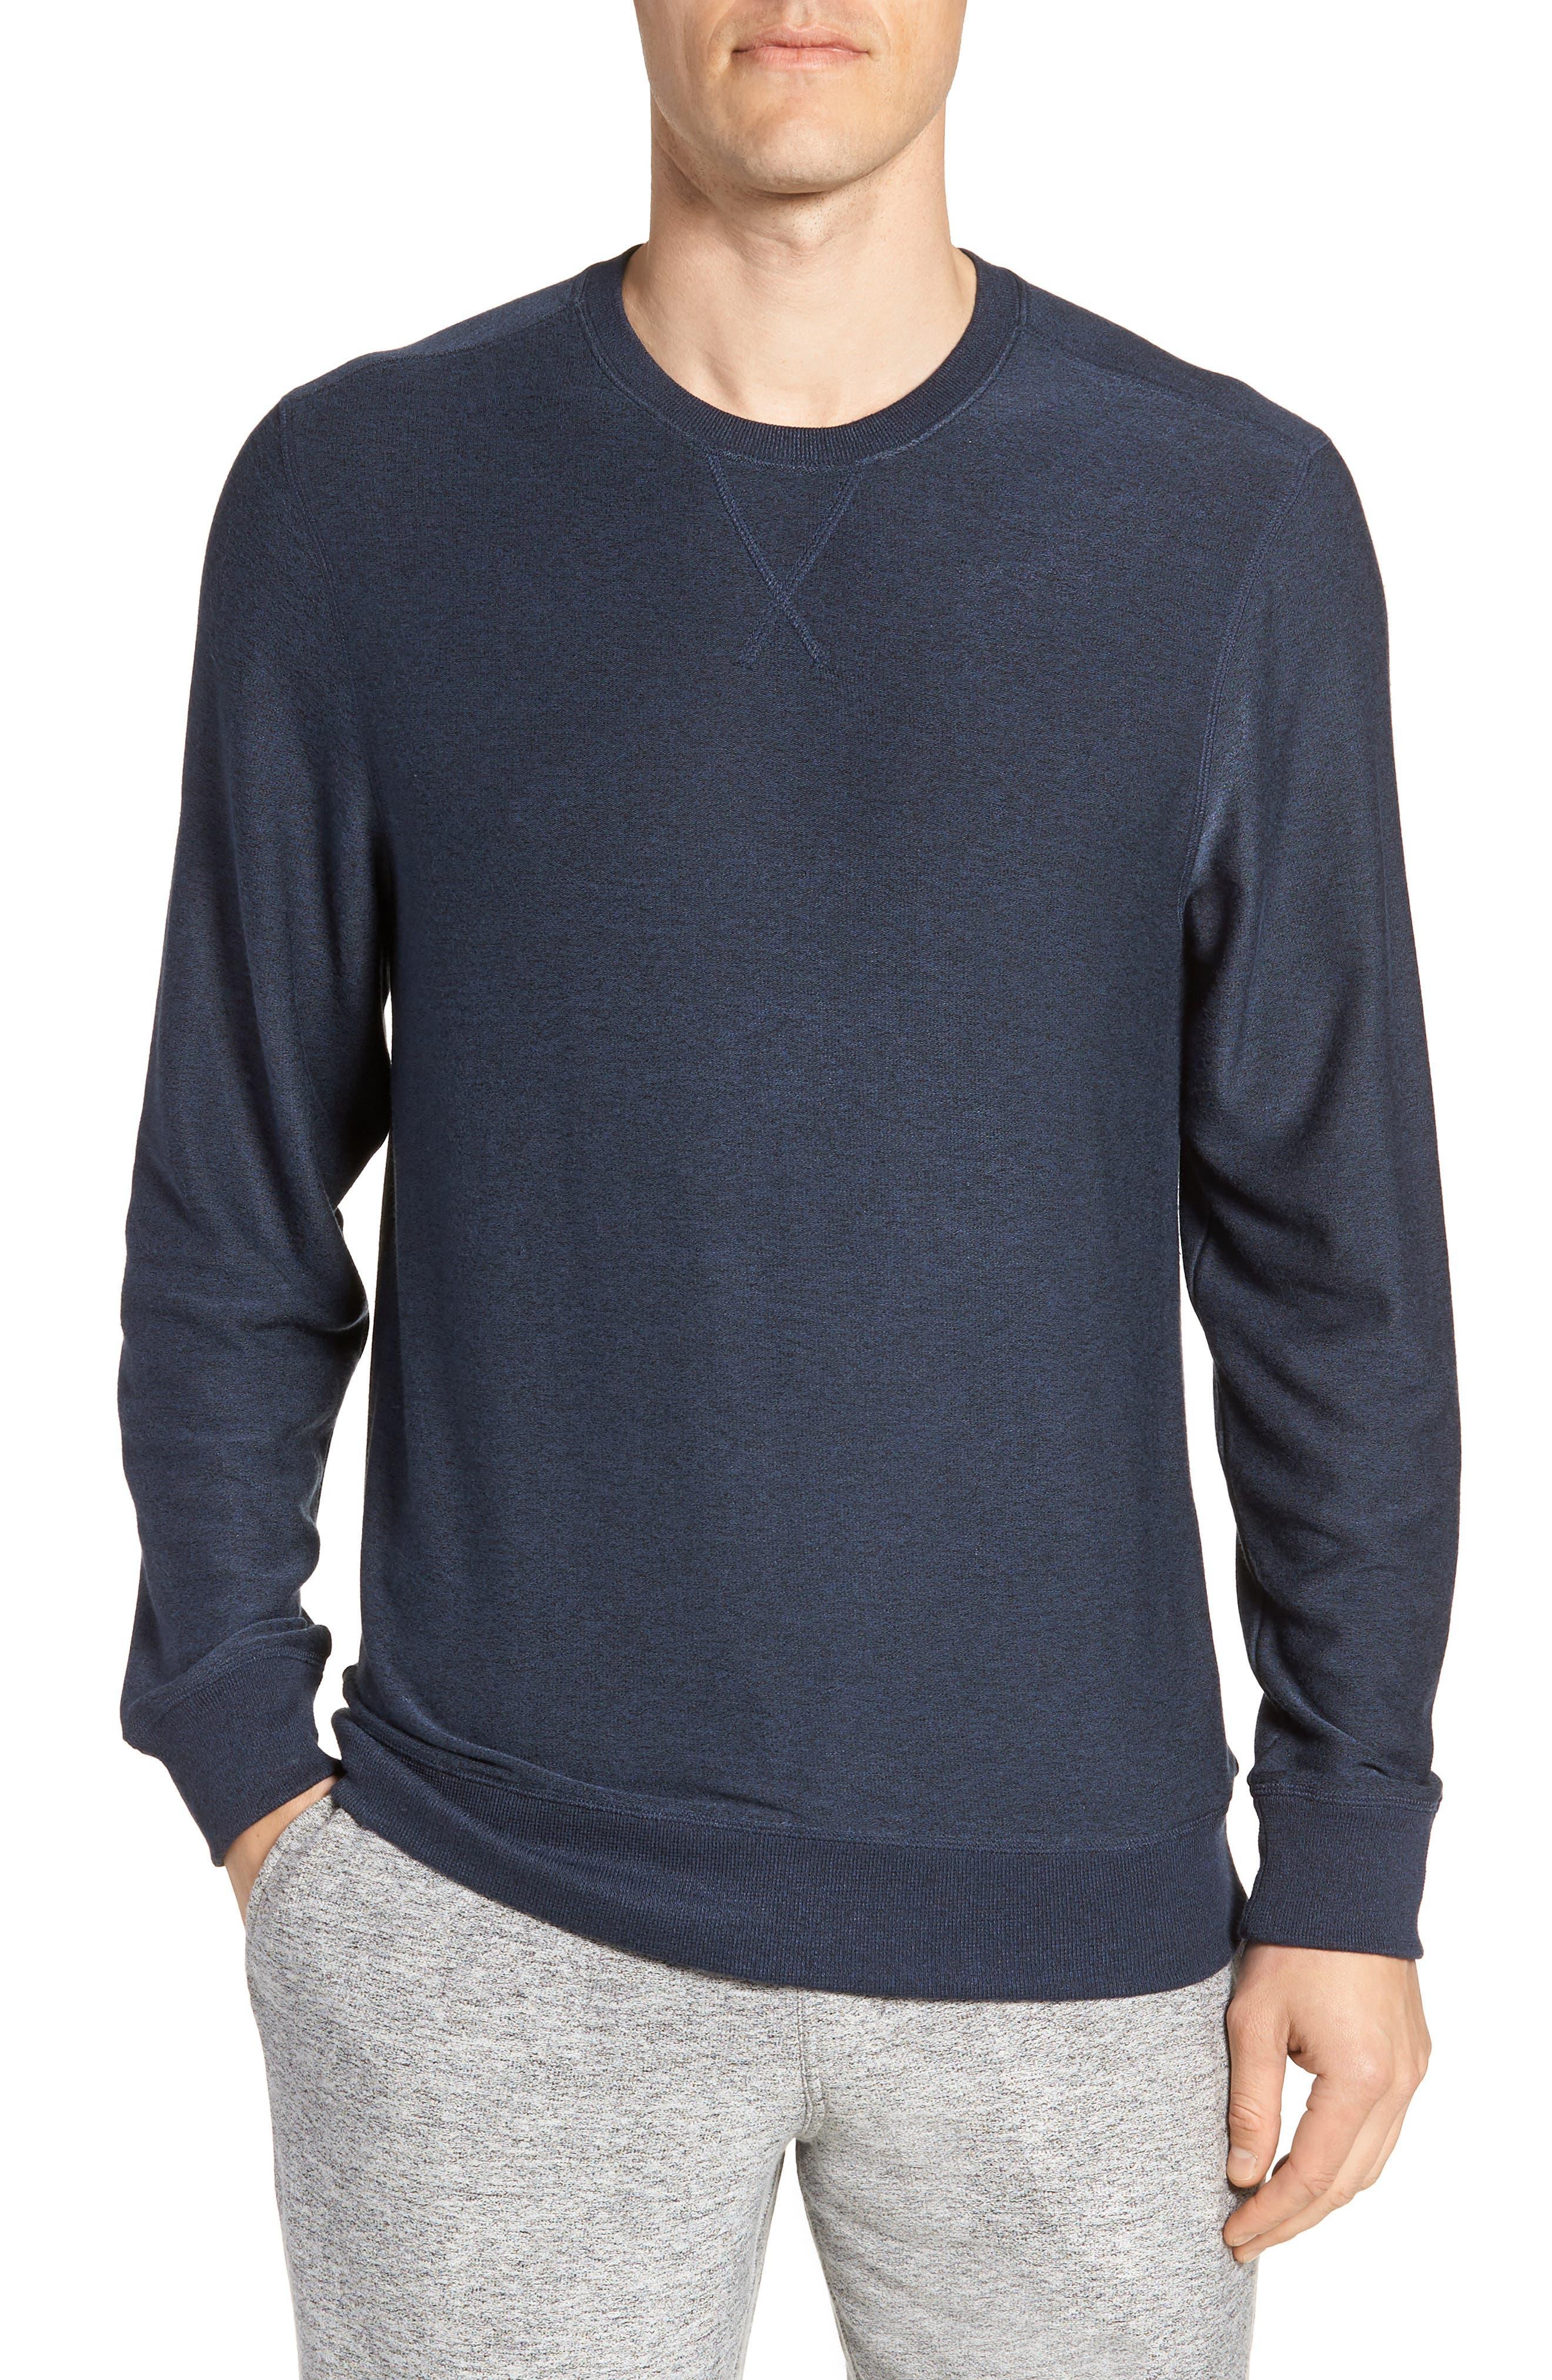 Ultra Soft Crewneck Sweatshirt,                         Main,                         color, Navy Indigo Marl